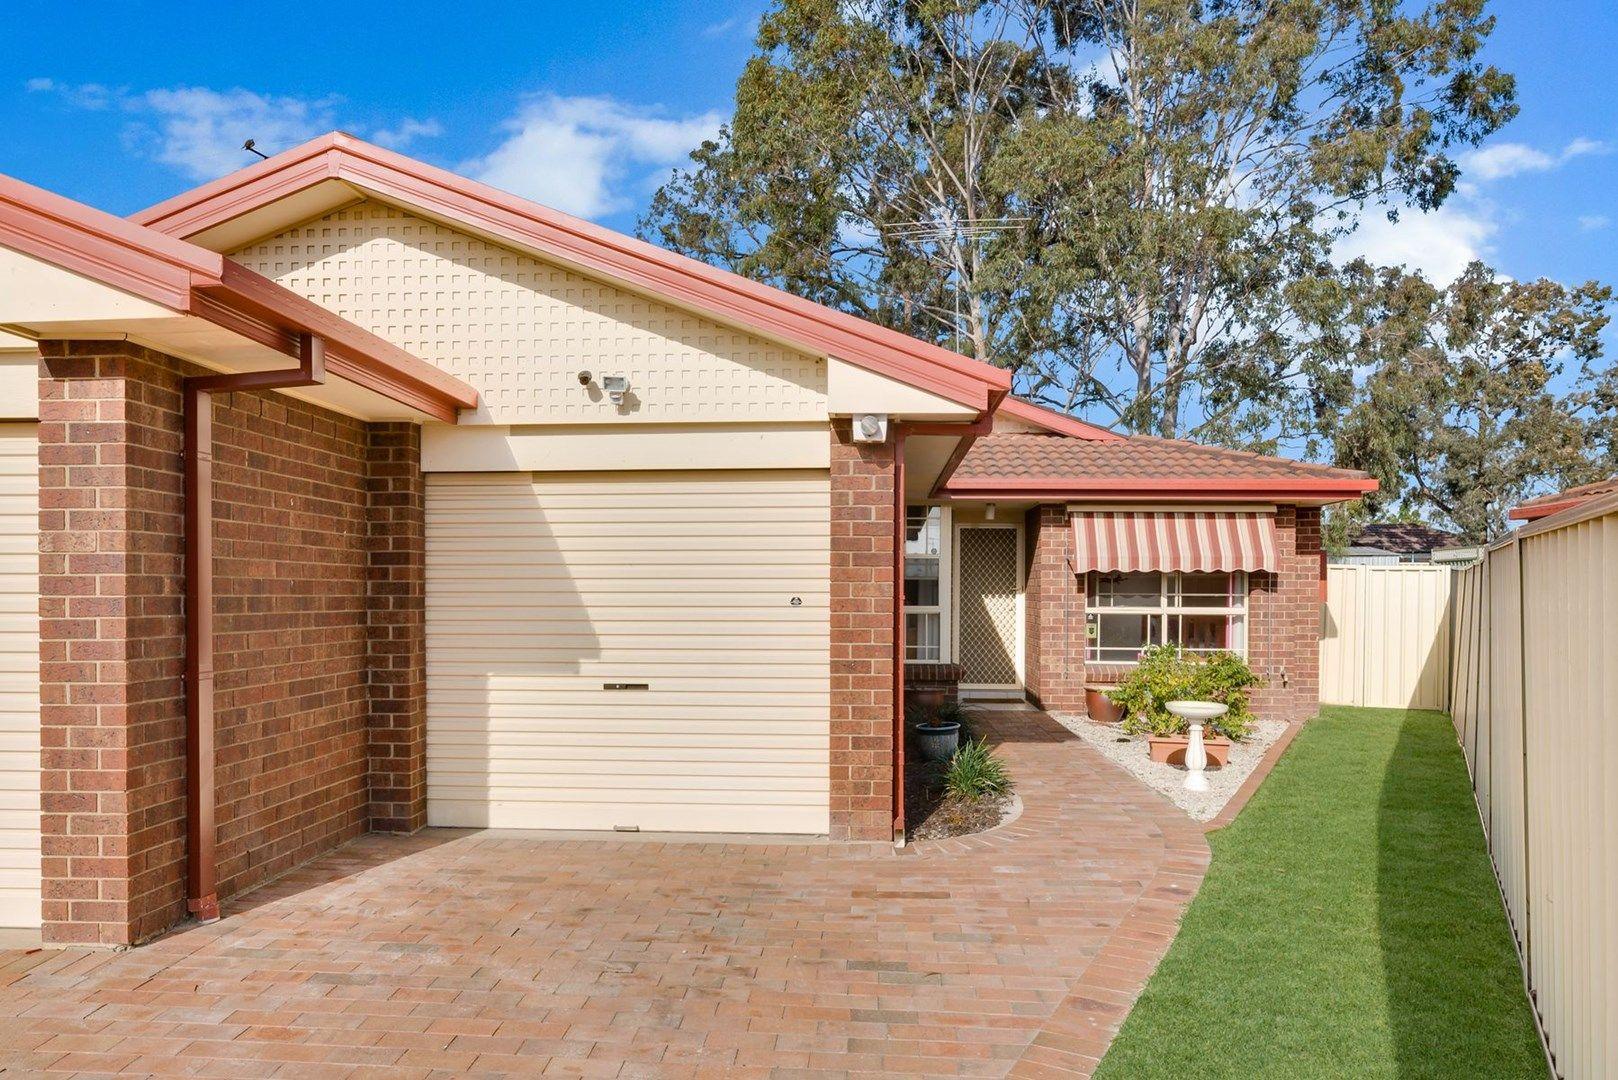 2/11 Chausson Place, Cranebrook NSW 2749, Image 0